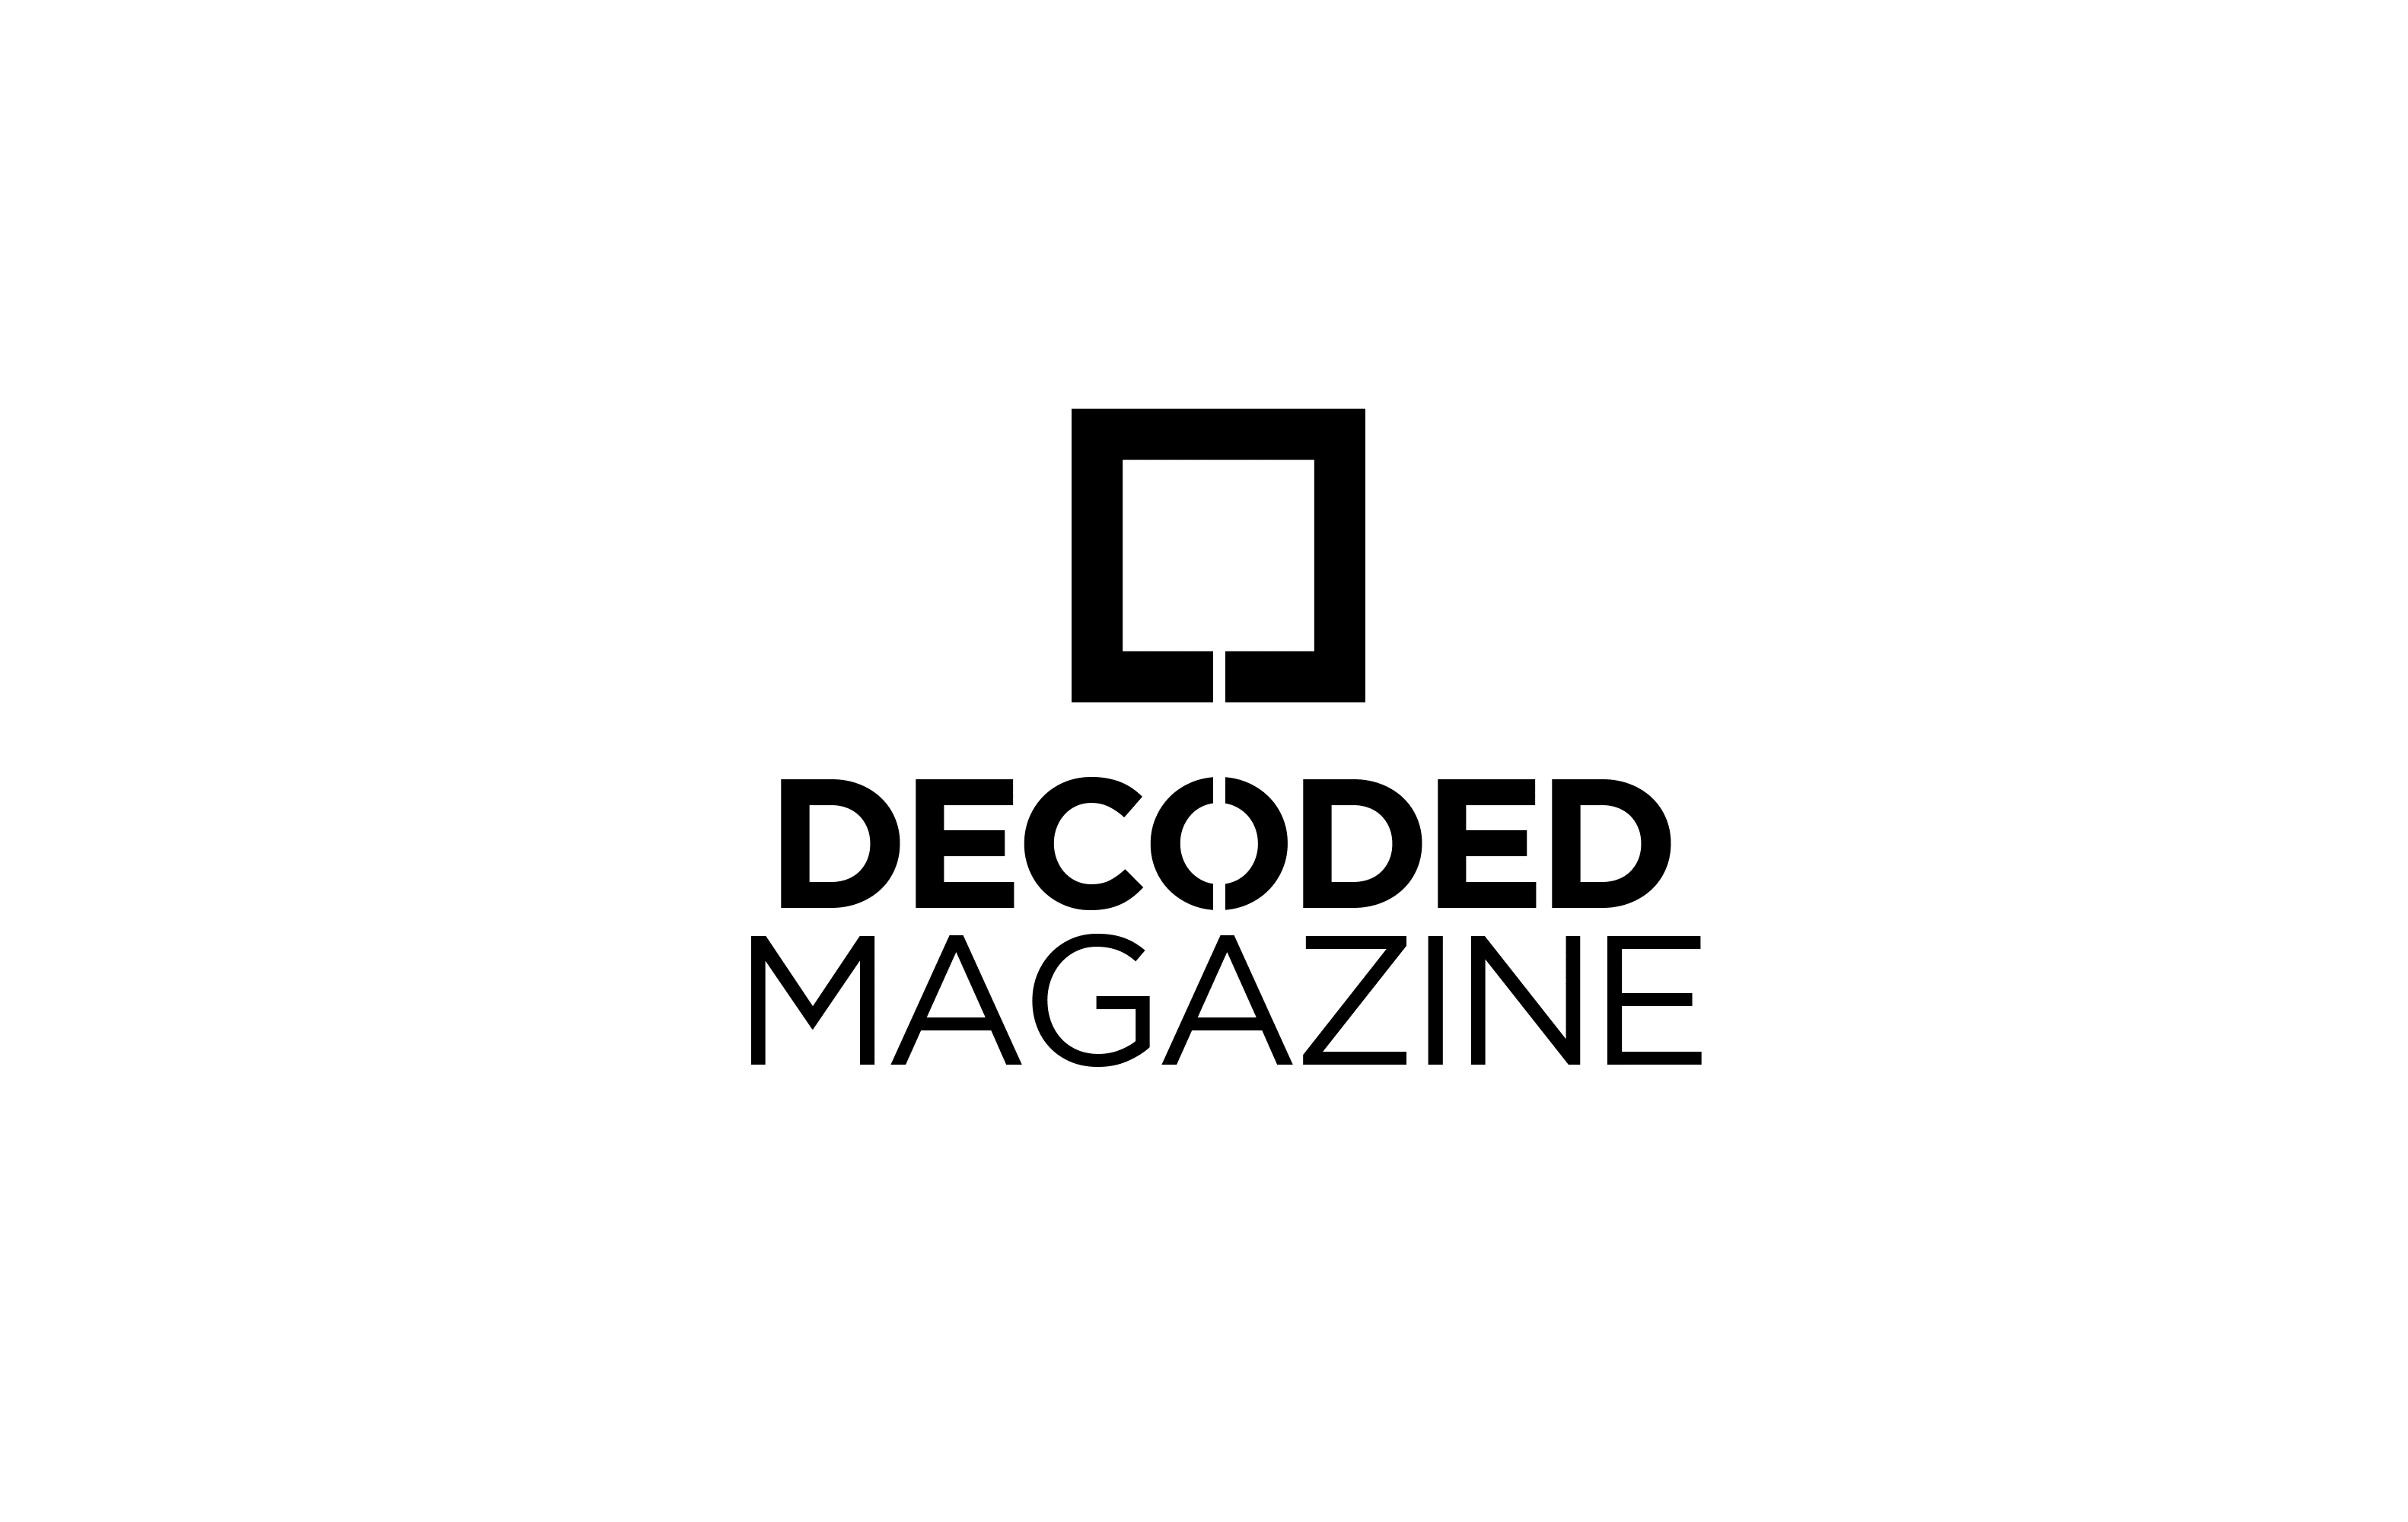 logo-decoded-sept2015-v3-final